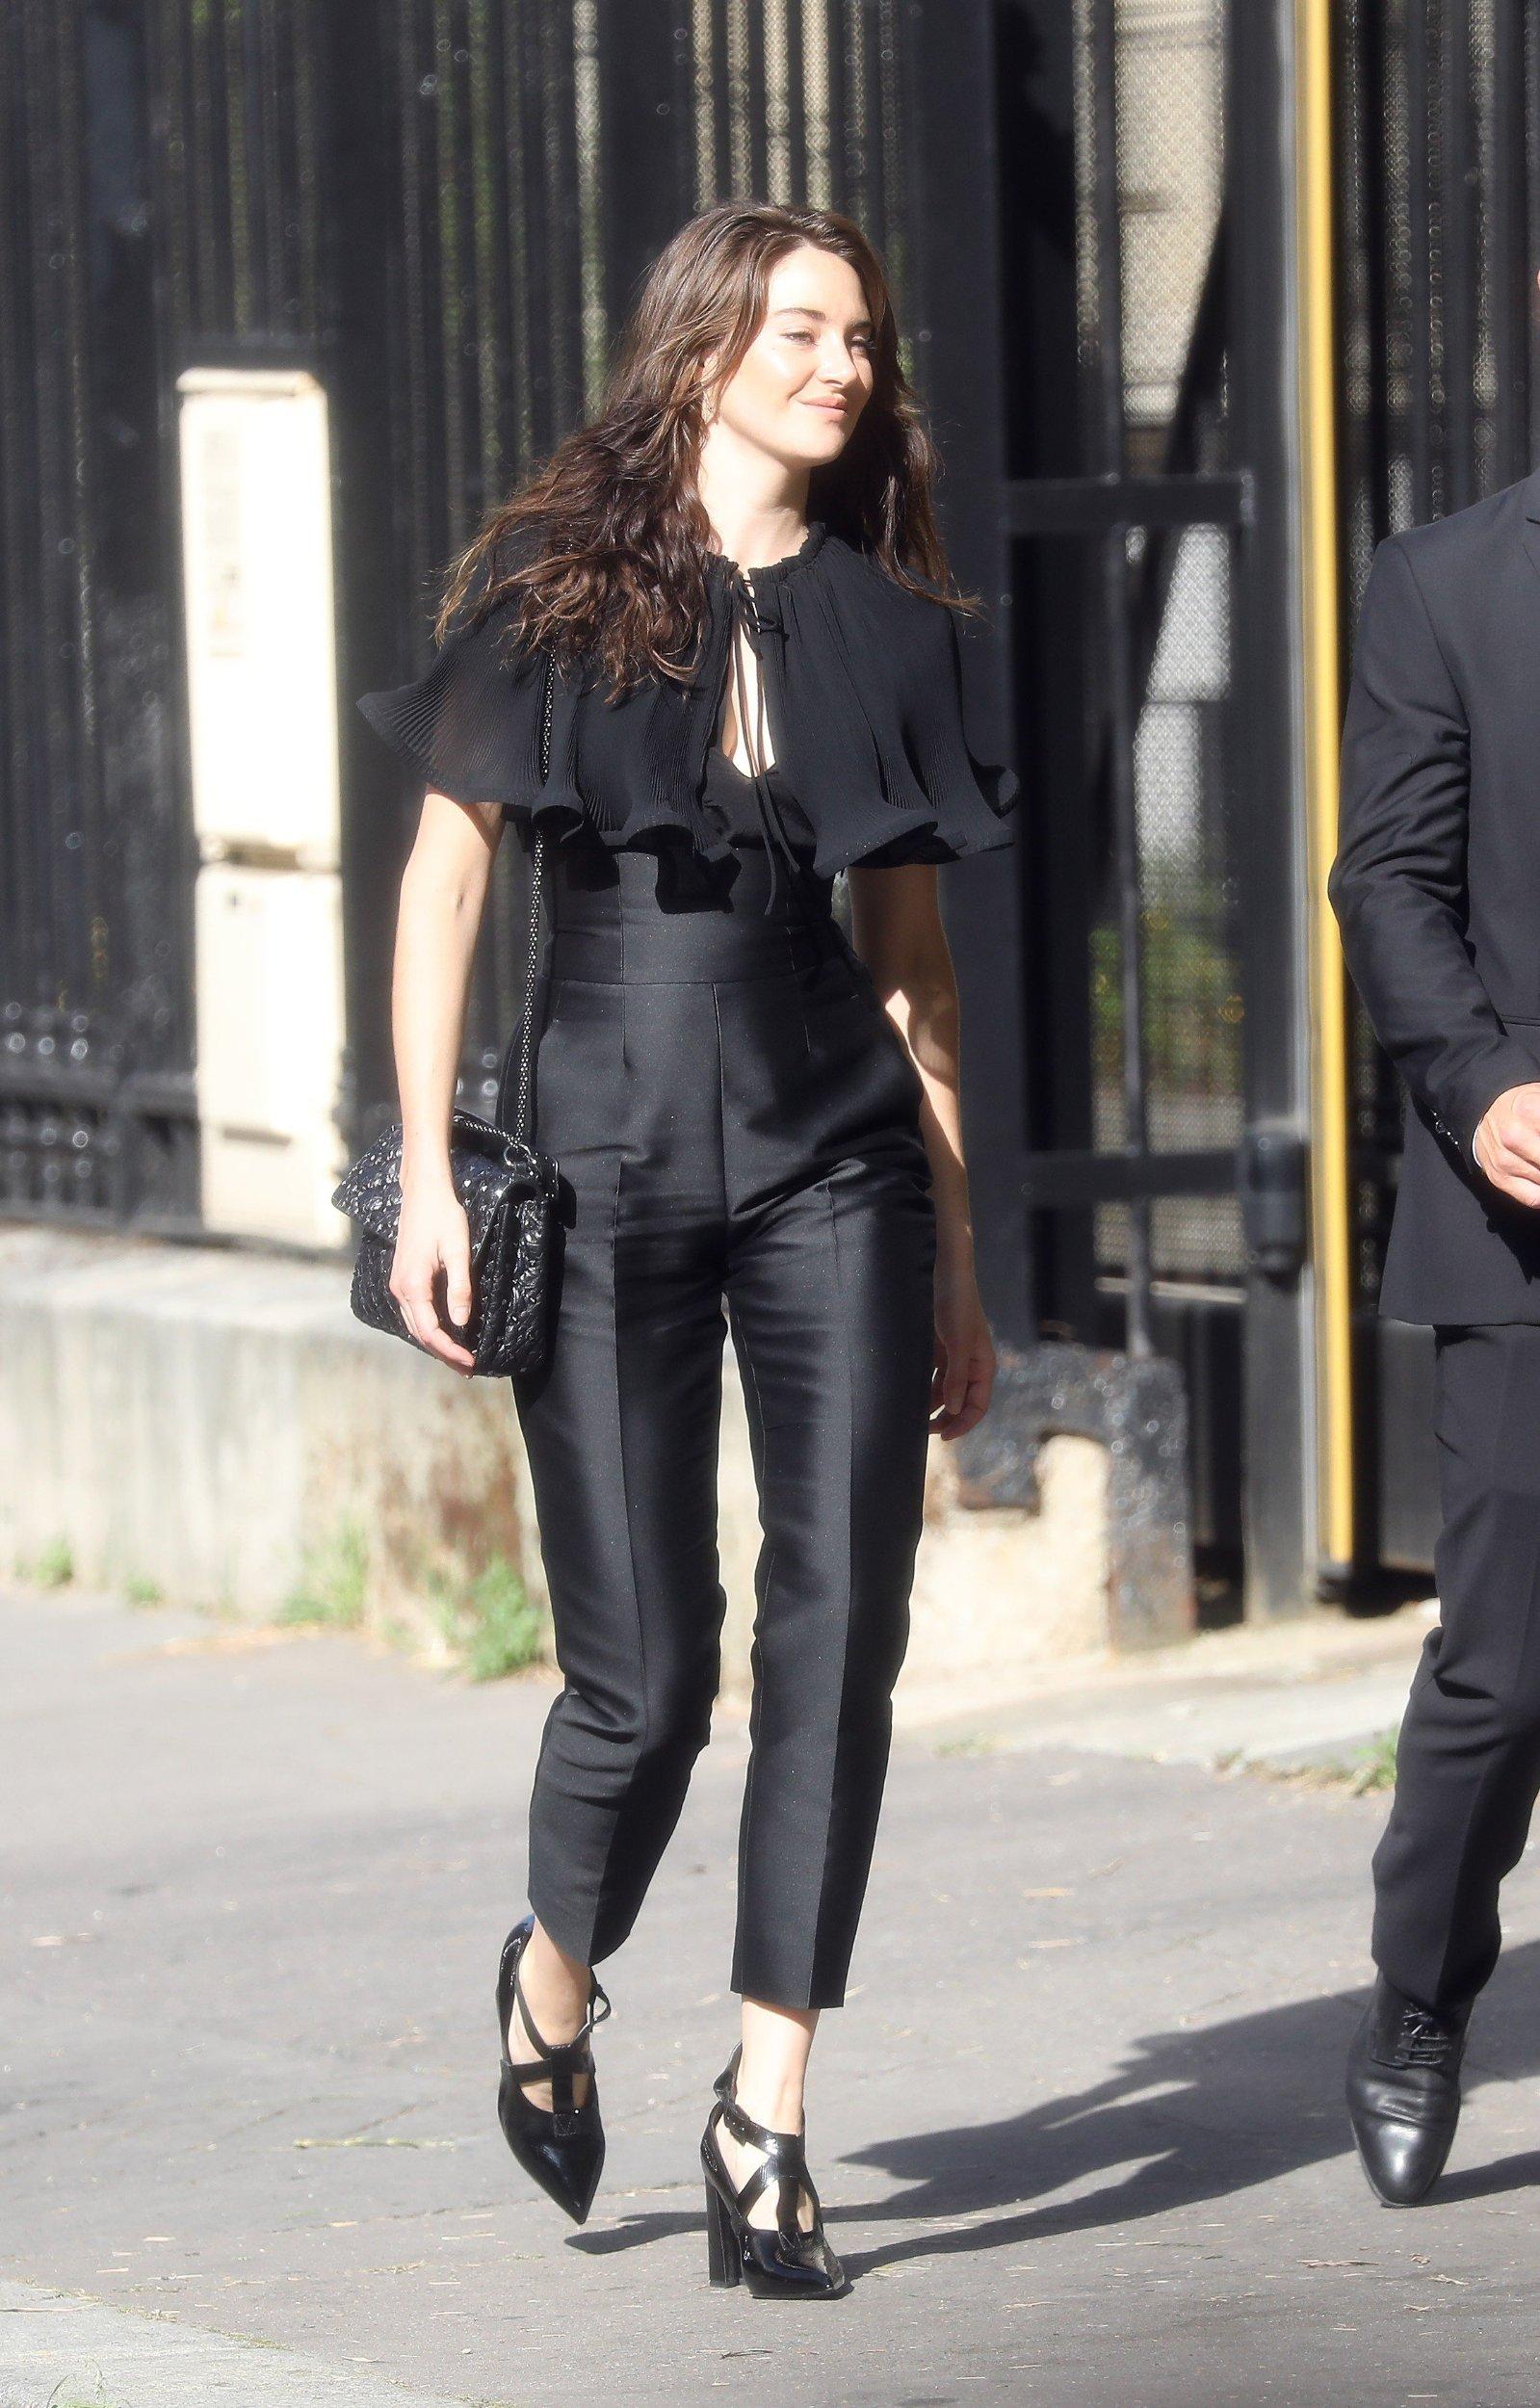 Shailene Woodley Zoe Kravitz Wedding with guests in the Lenny Kravitz parisian home Guests Paris le 29 juin 2019, Image: 452612009, License: Rights-managed, Restrictions: , Model Release: no, Credit line: Profimedia, KCS Presse